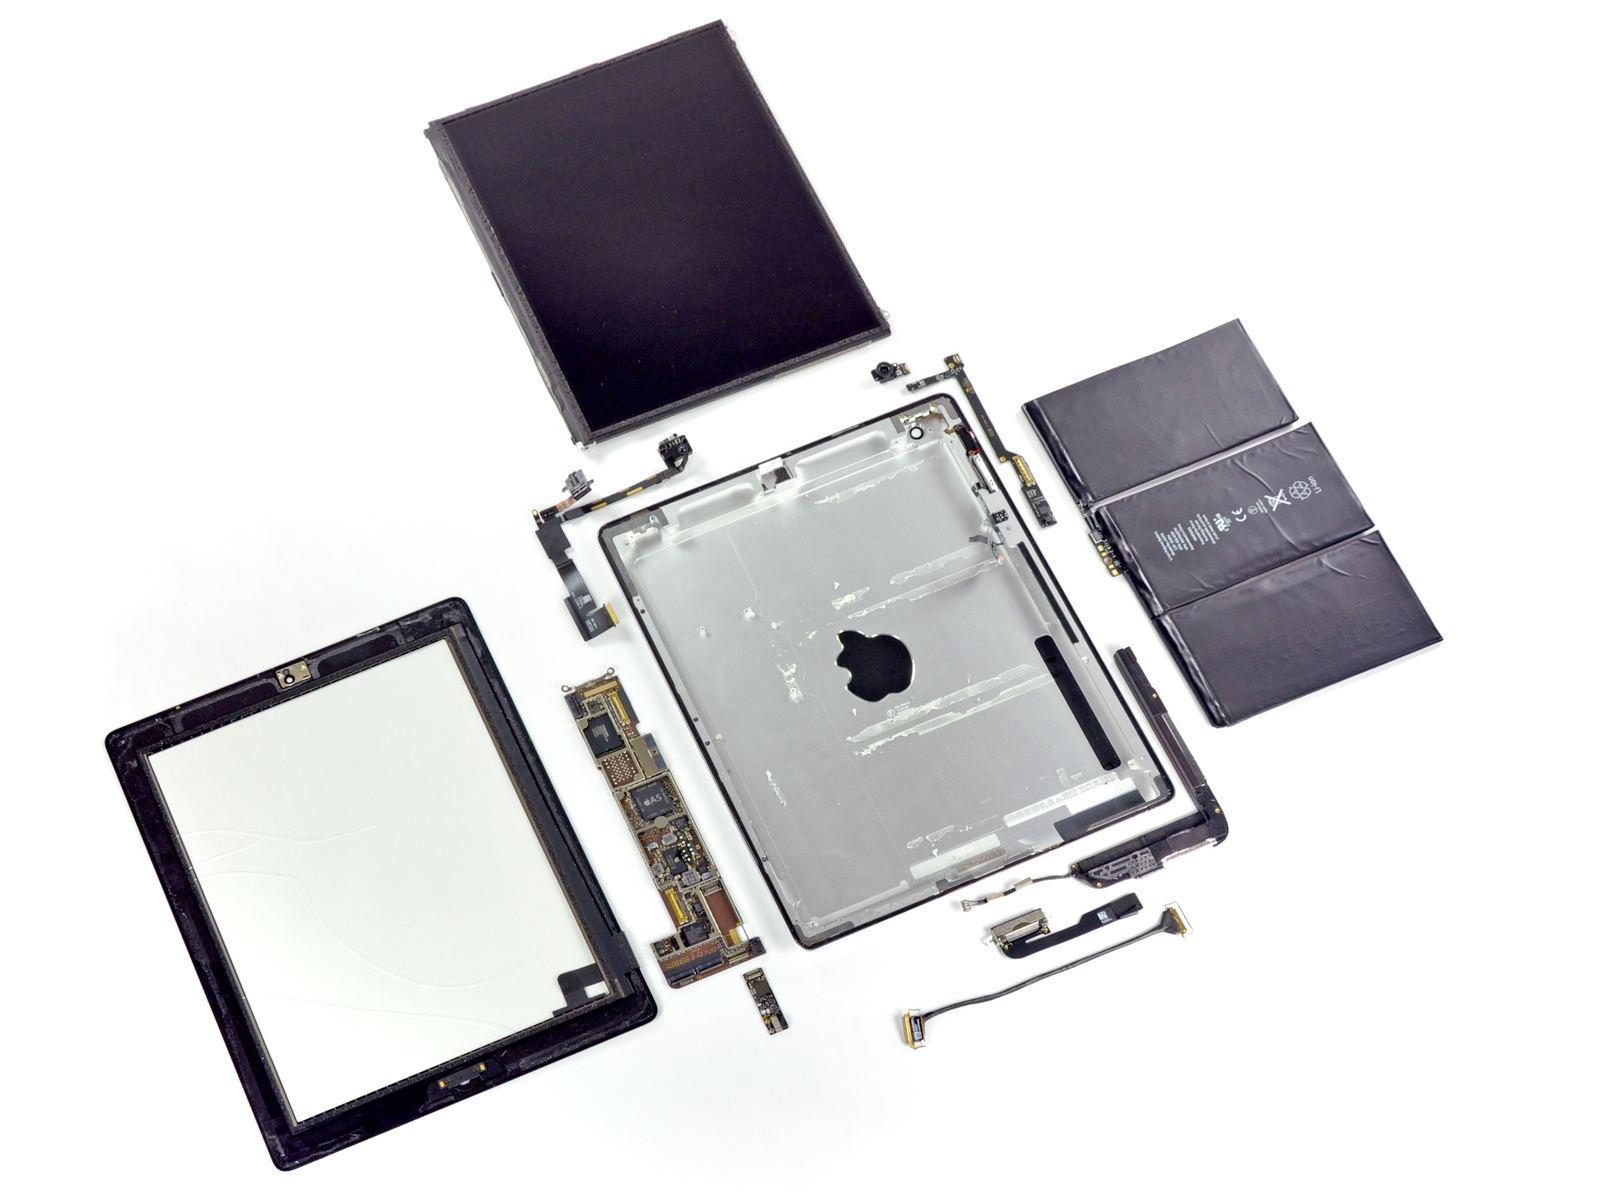 Fábrica de iPads no Brasil